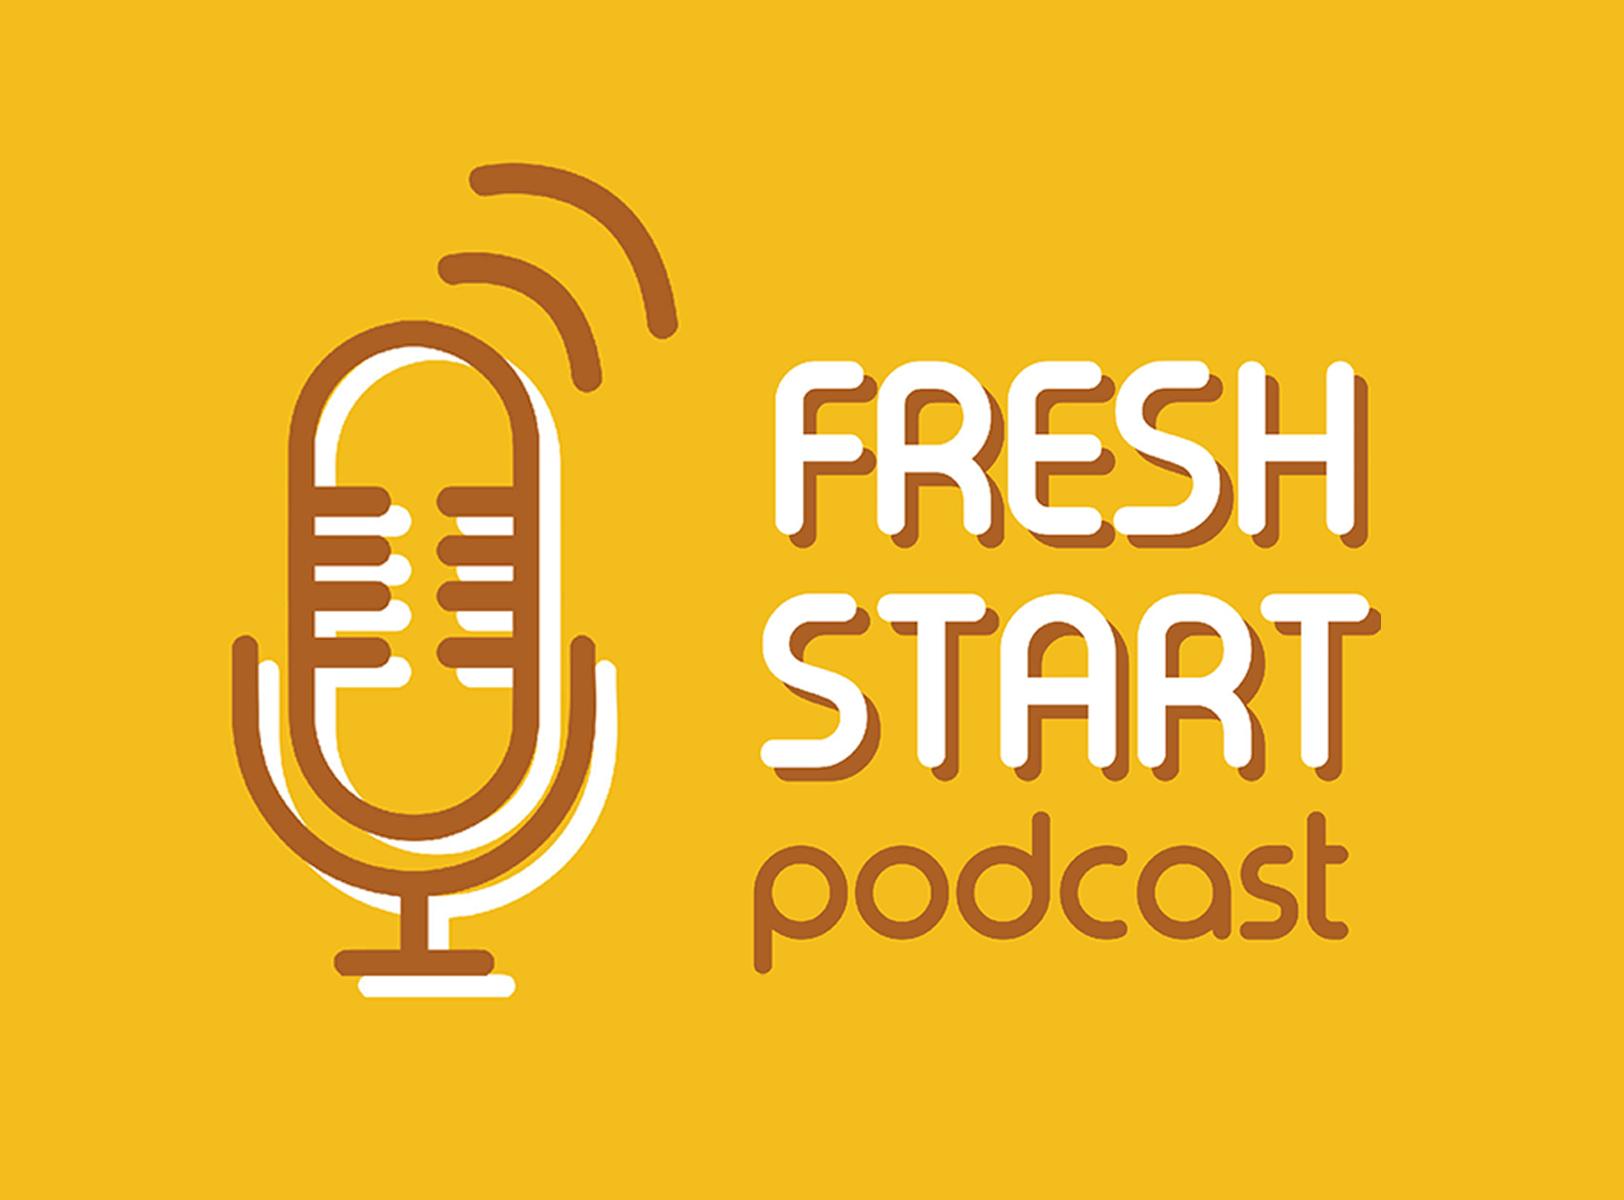 Fresh Start: Podcast News (7/9/2019 Tue.)